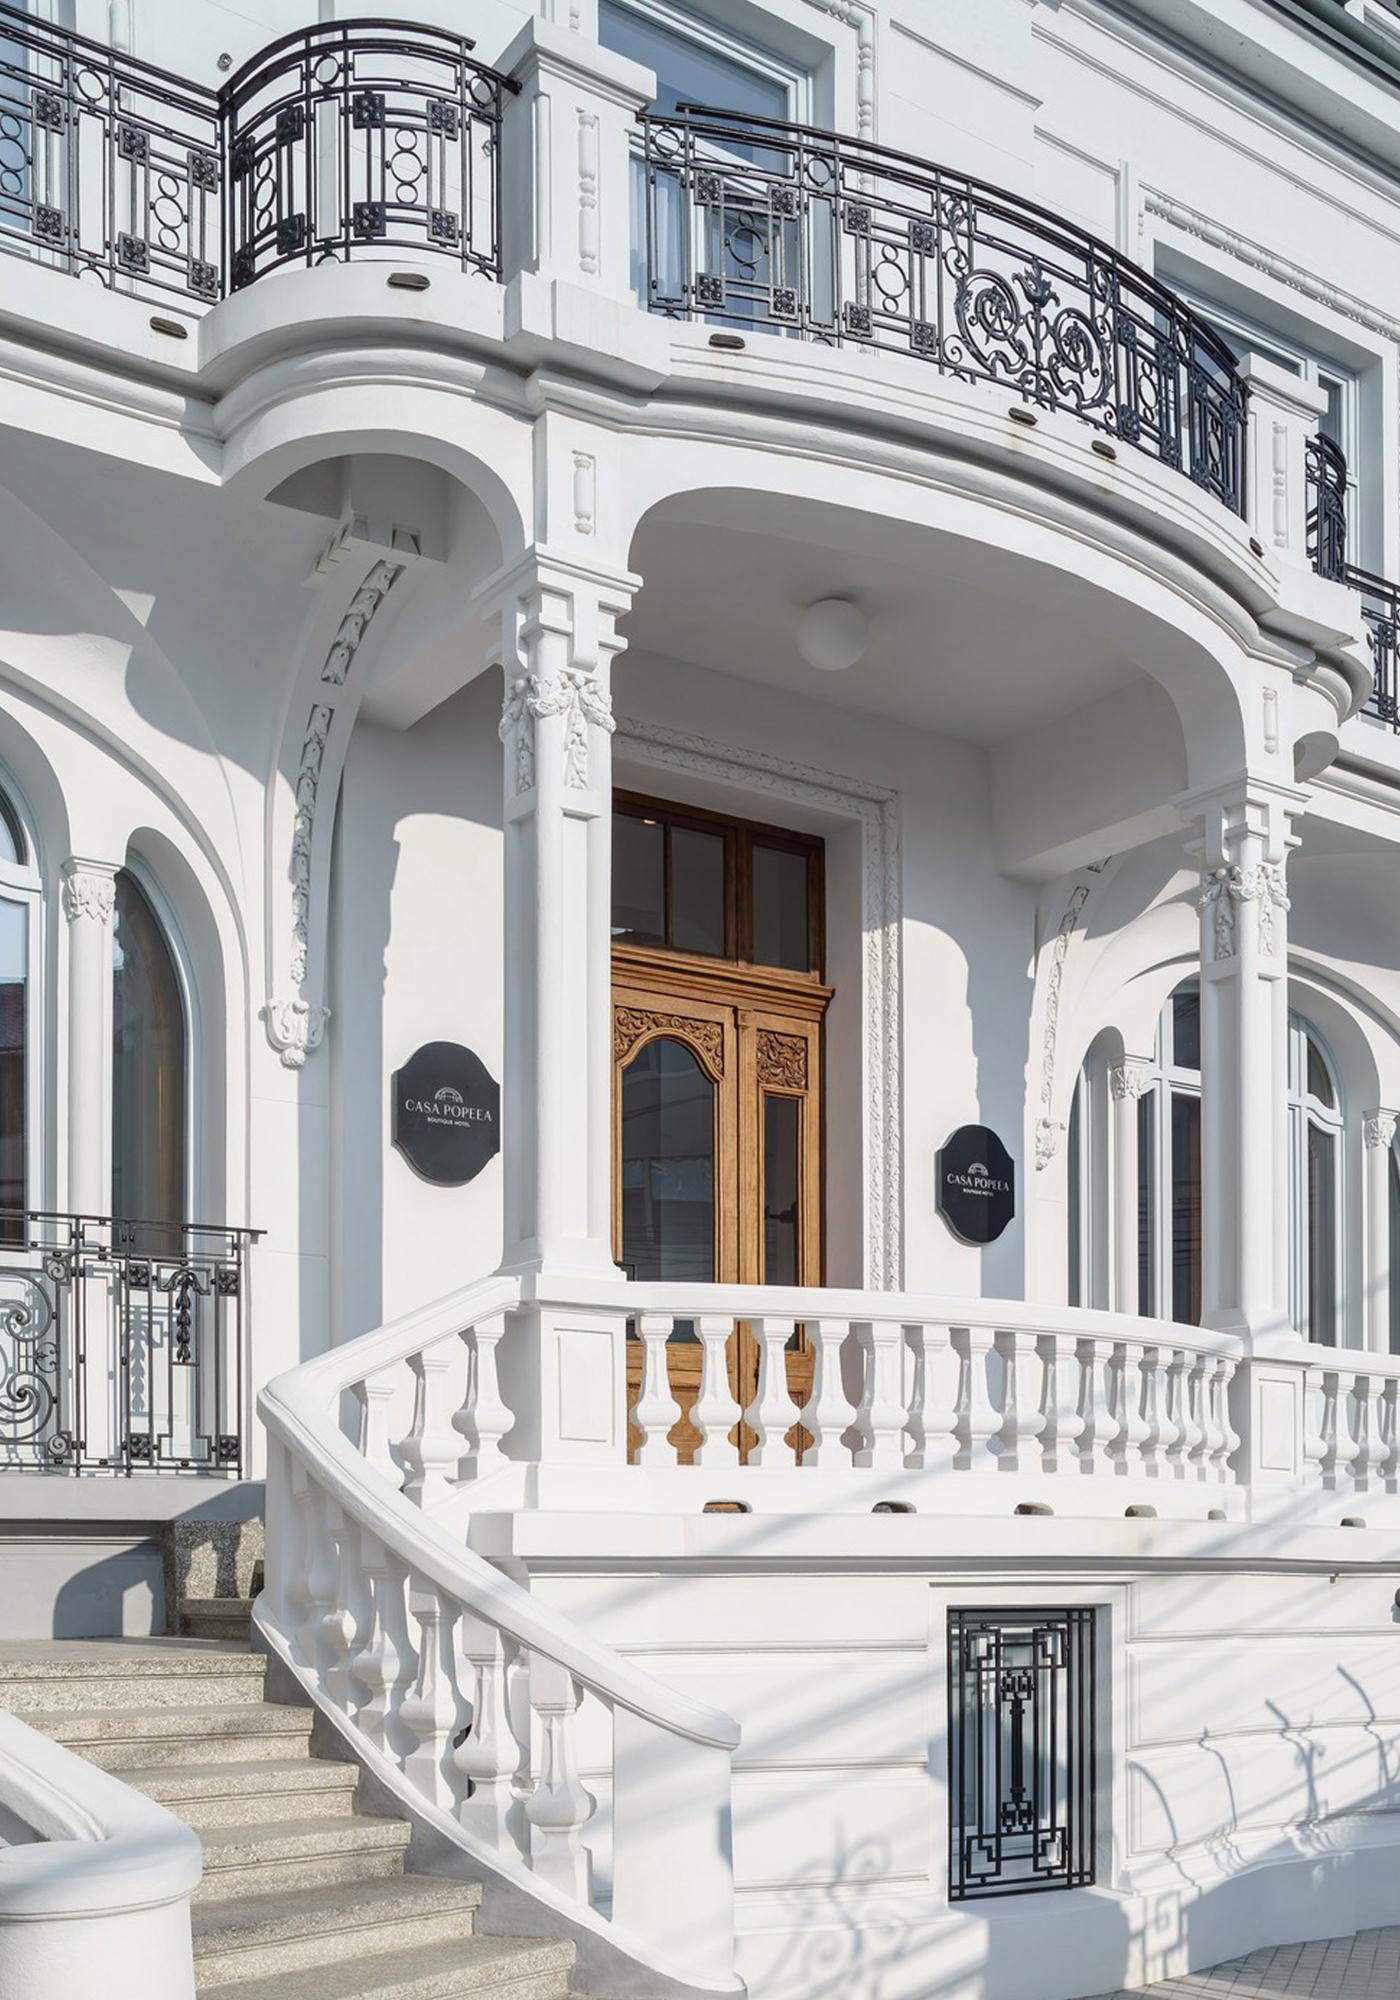 Casa Popeea Hotel Architecture Extérieure